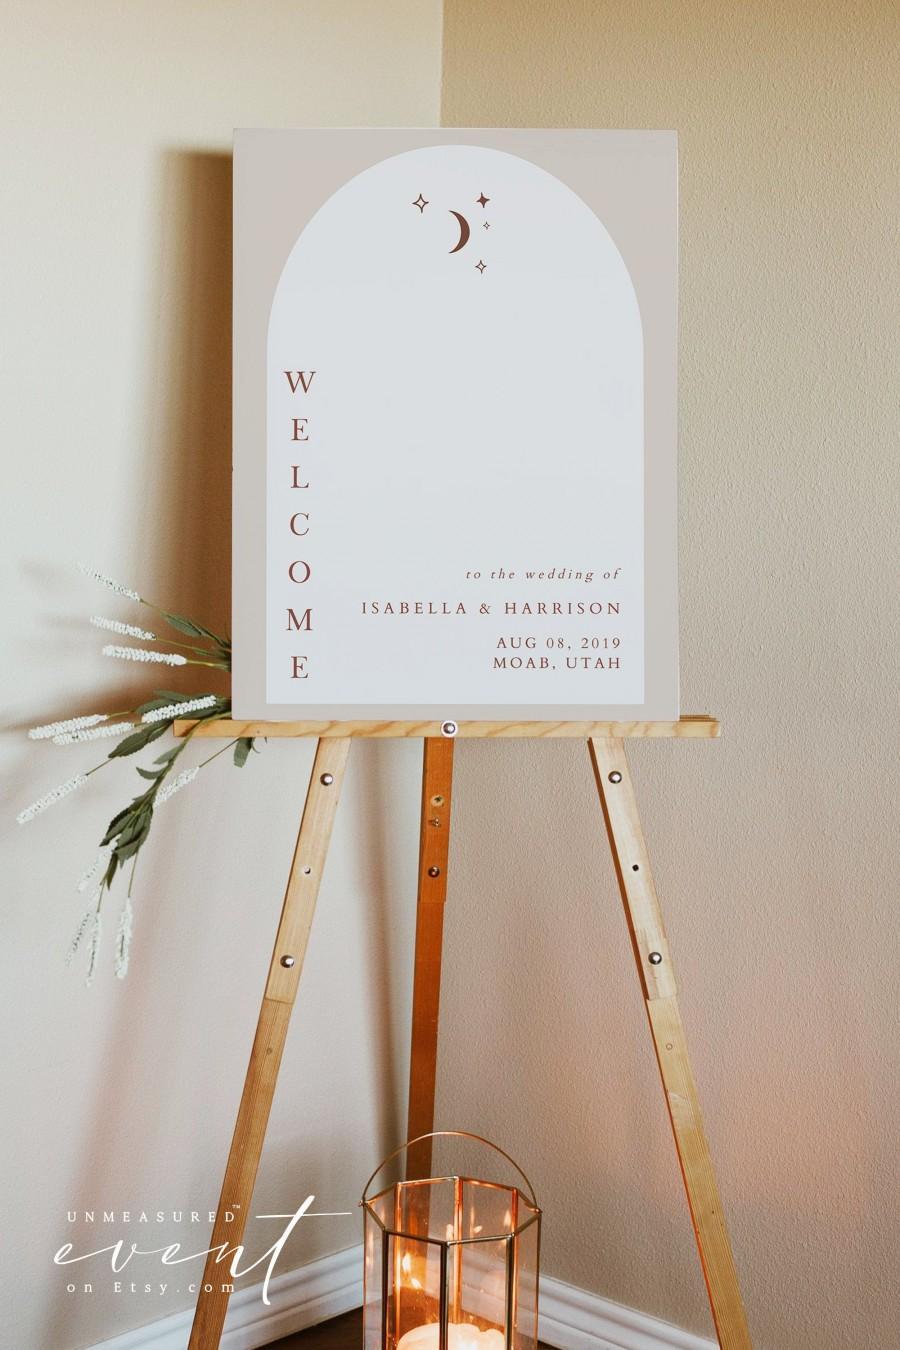 Свадьба - CELESTE Arched Boho Wedding Welcome Sign Template, Terracotta Wedding Welcome Poster Printable, Celestial Welcome Sign, Lunar Wedding DIY